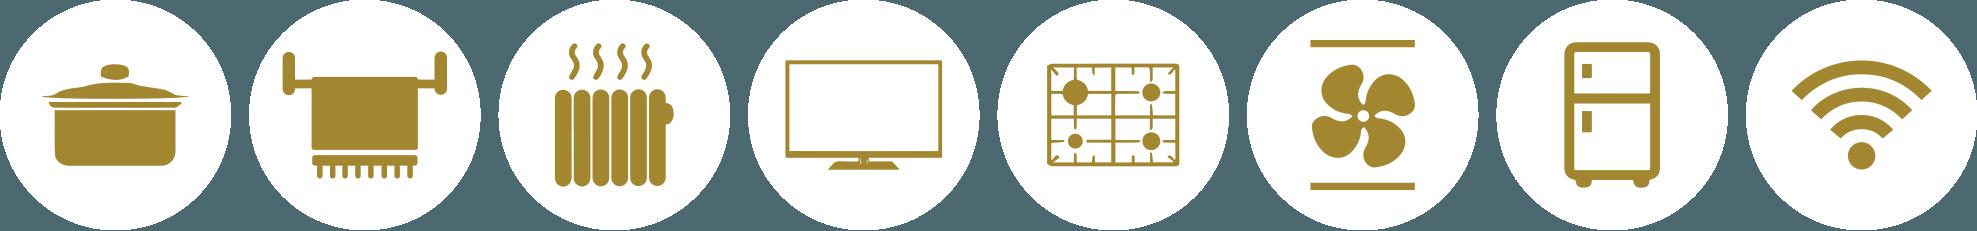 icone-facilities-sfondo-bianco